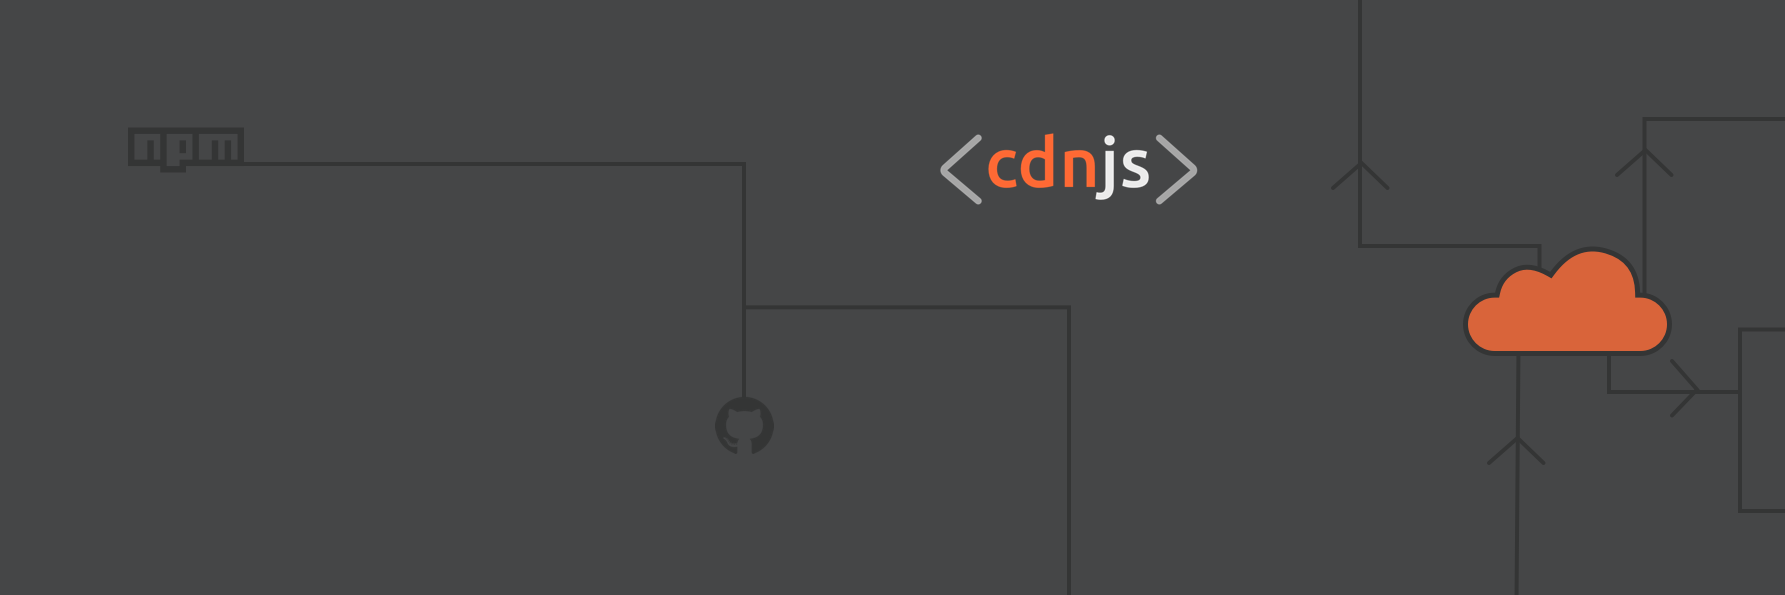 cdnjs/ajax/libs at master · cdnjs/cdnjs · GitHub